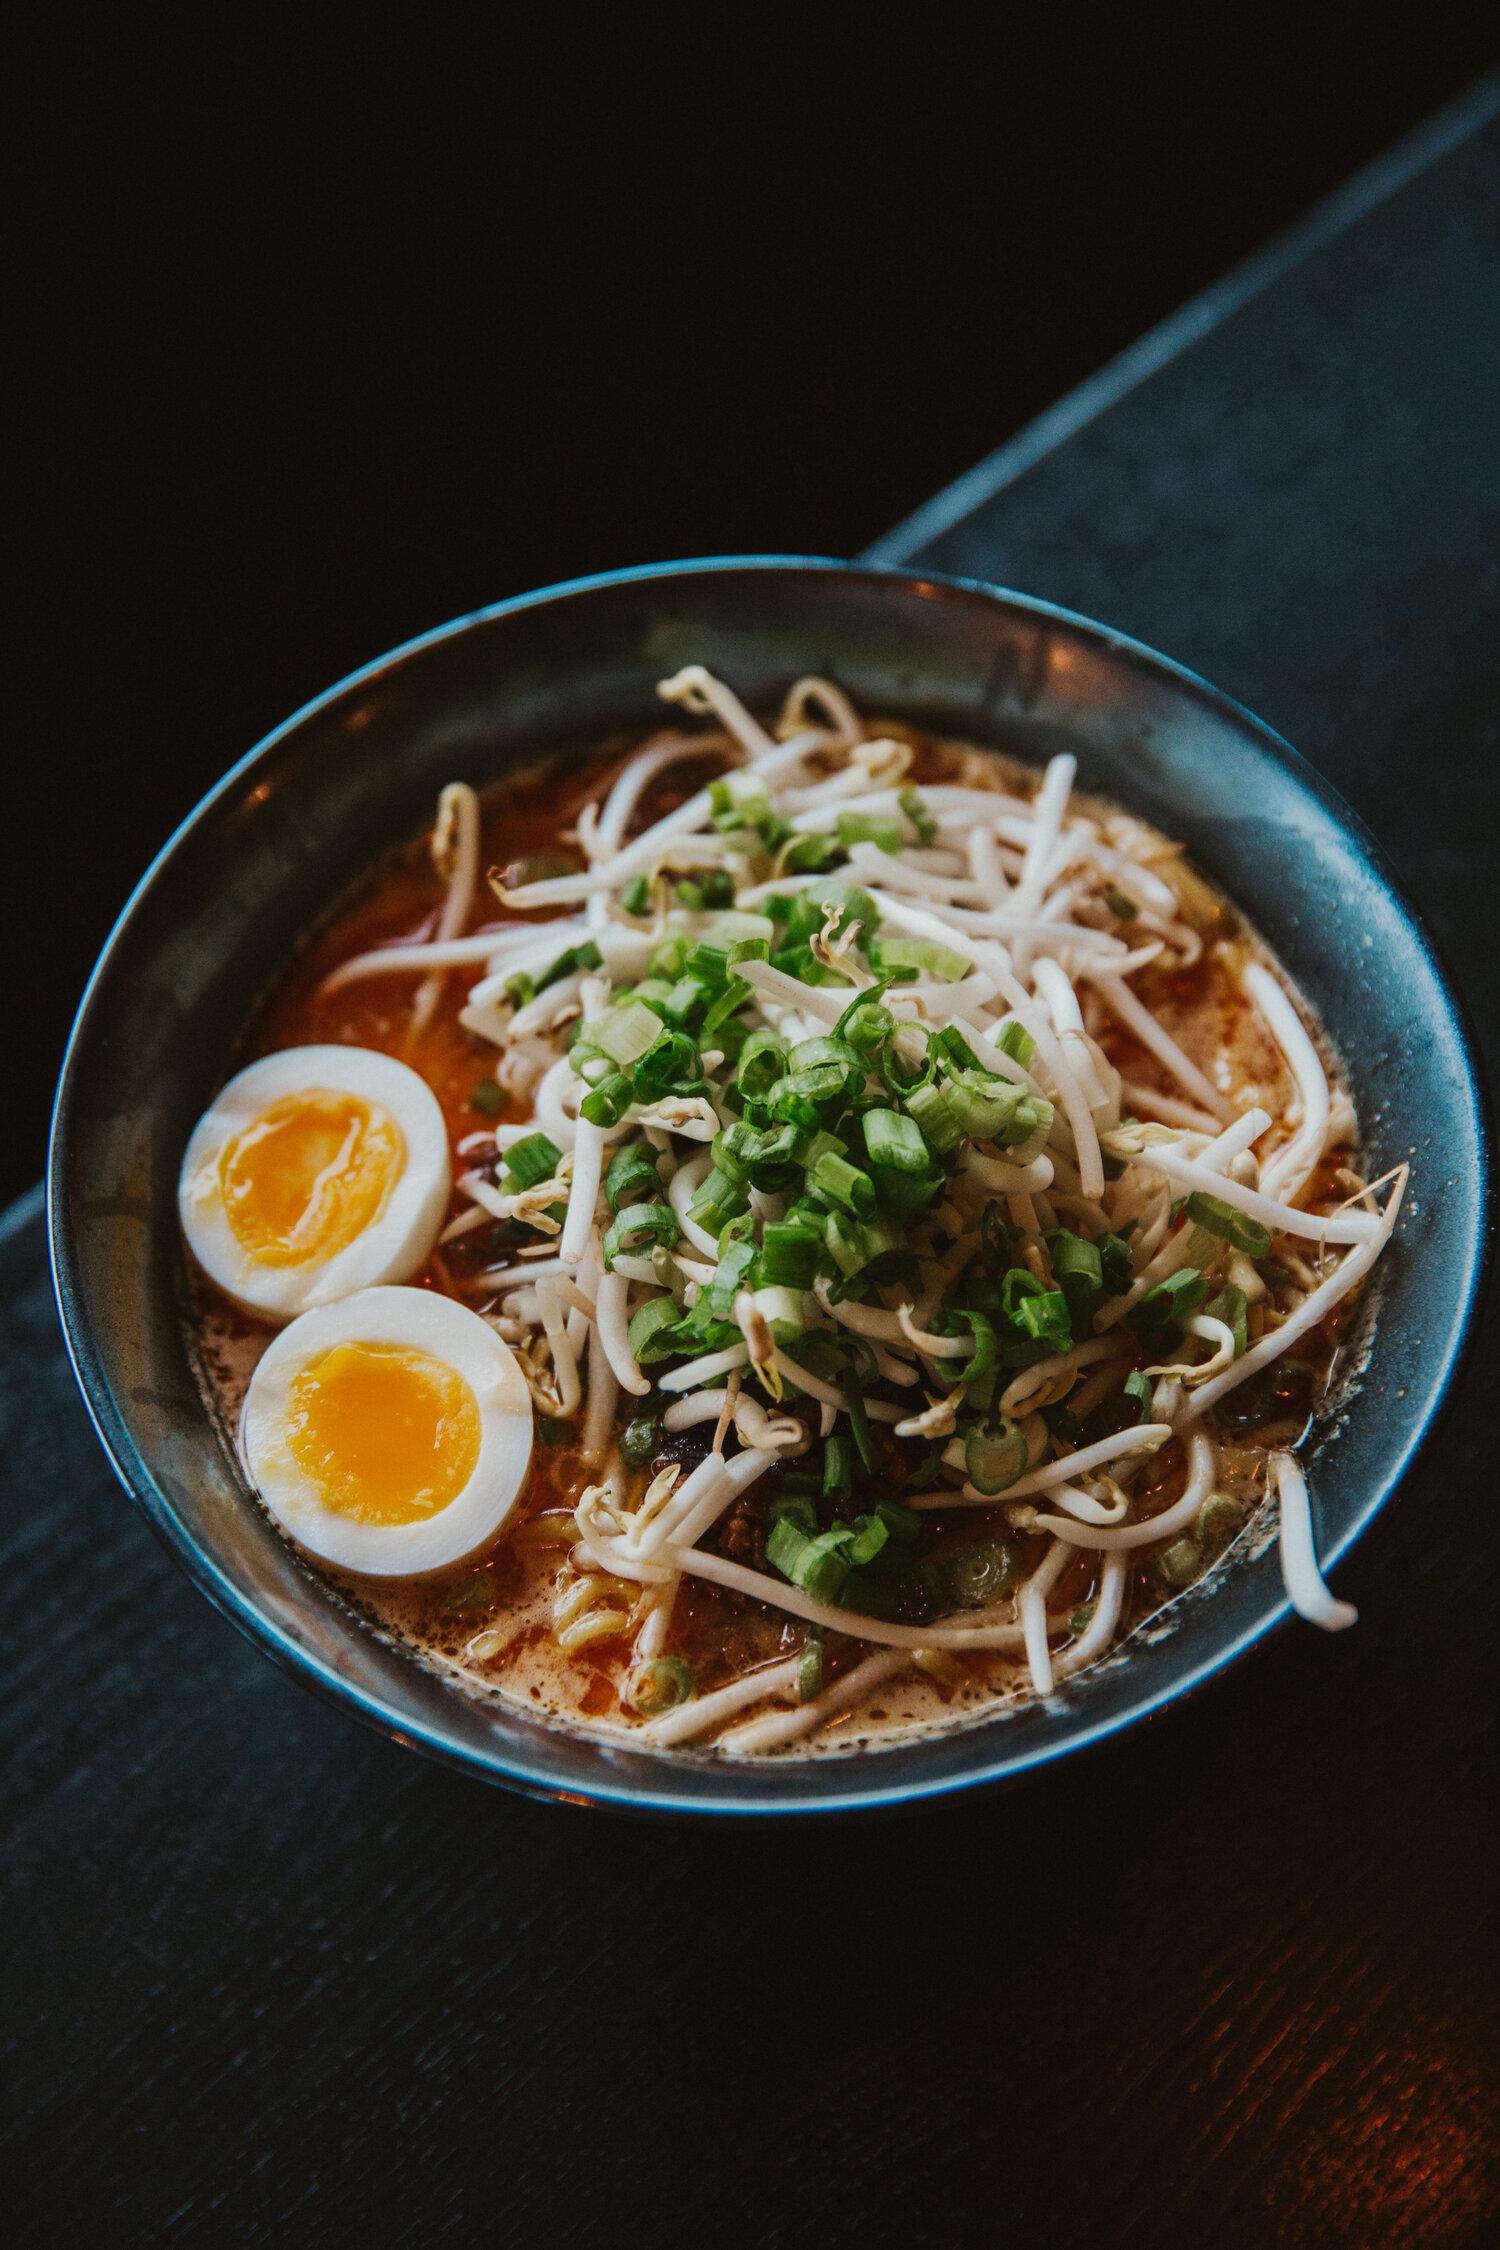 Spicy Miso Bowl